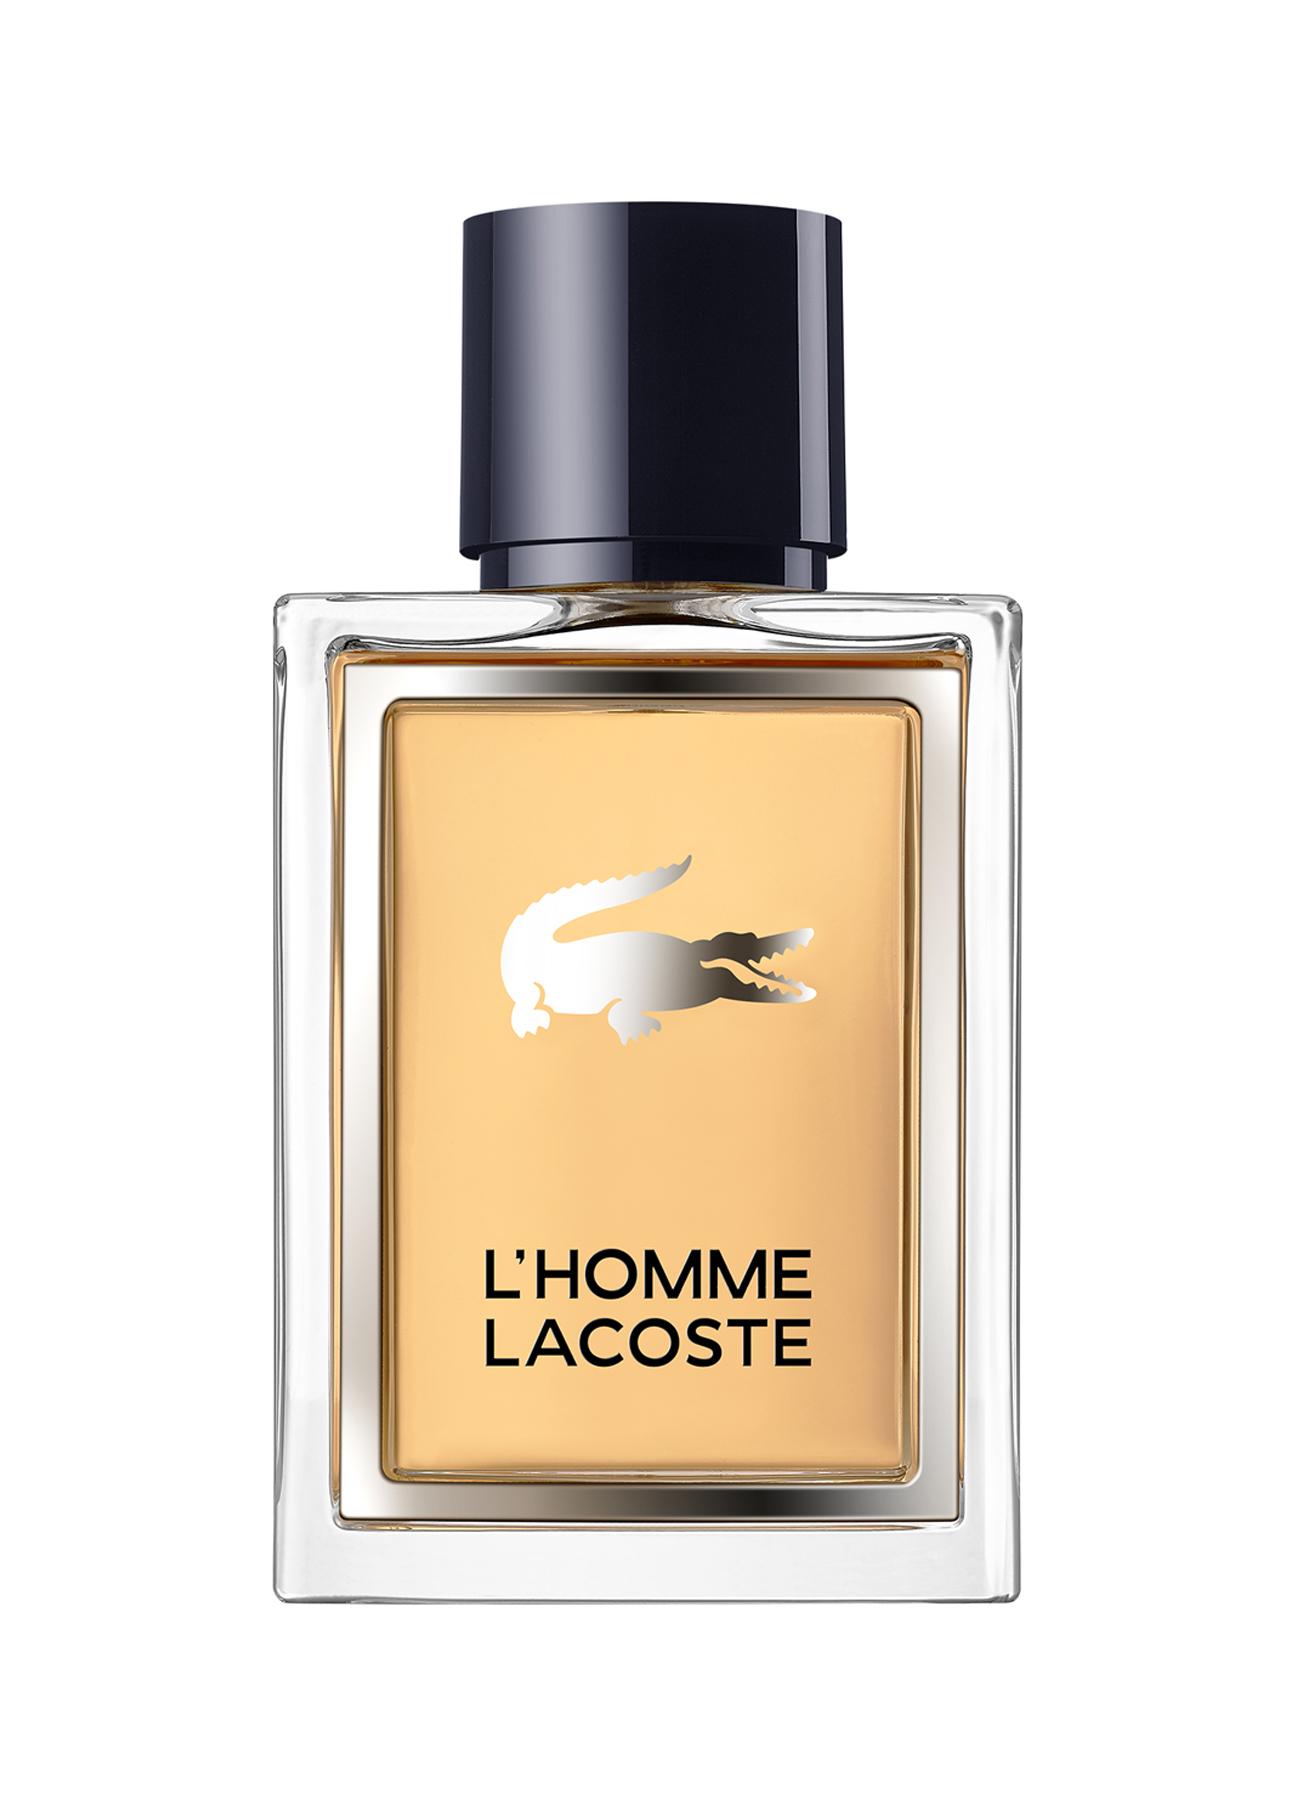 Lacoste L Homme Edt 50 ml Erkek Parfüm 5000211374001 Ürün Resmi